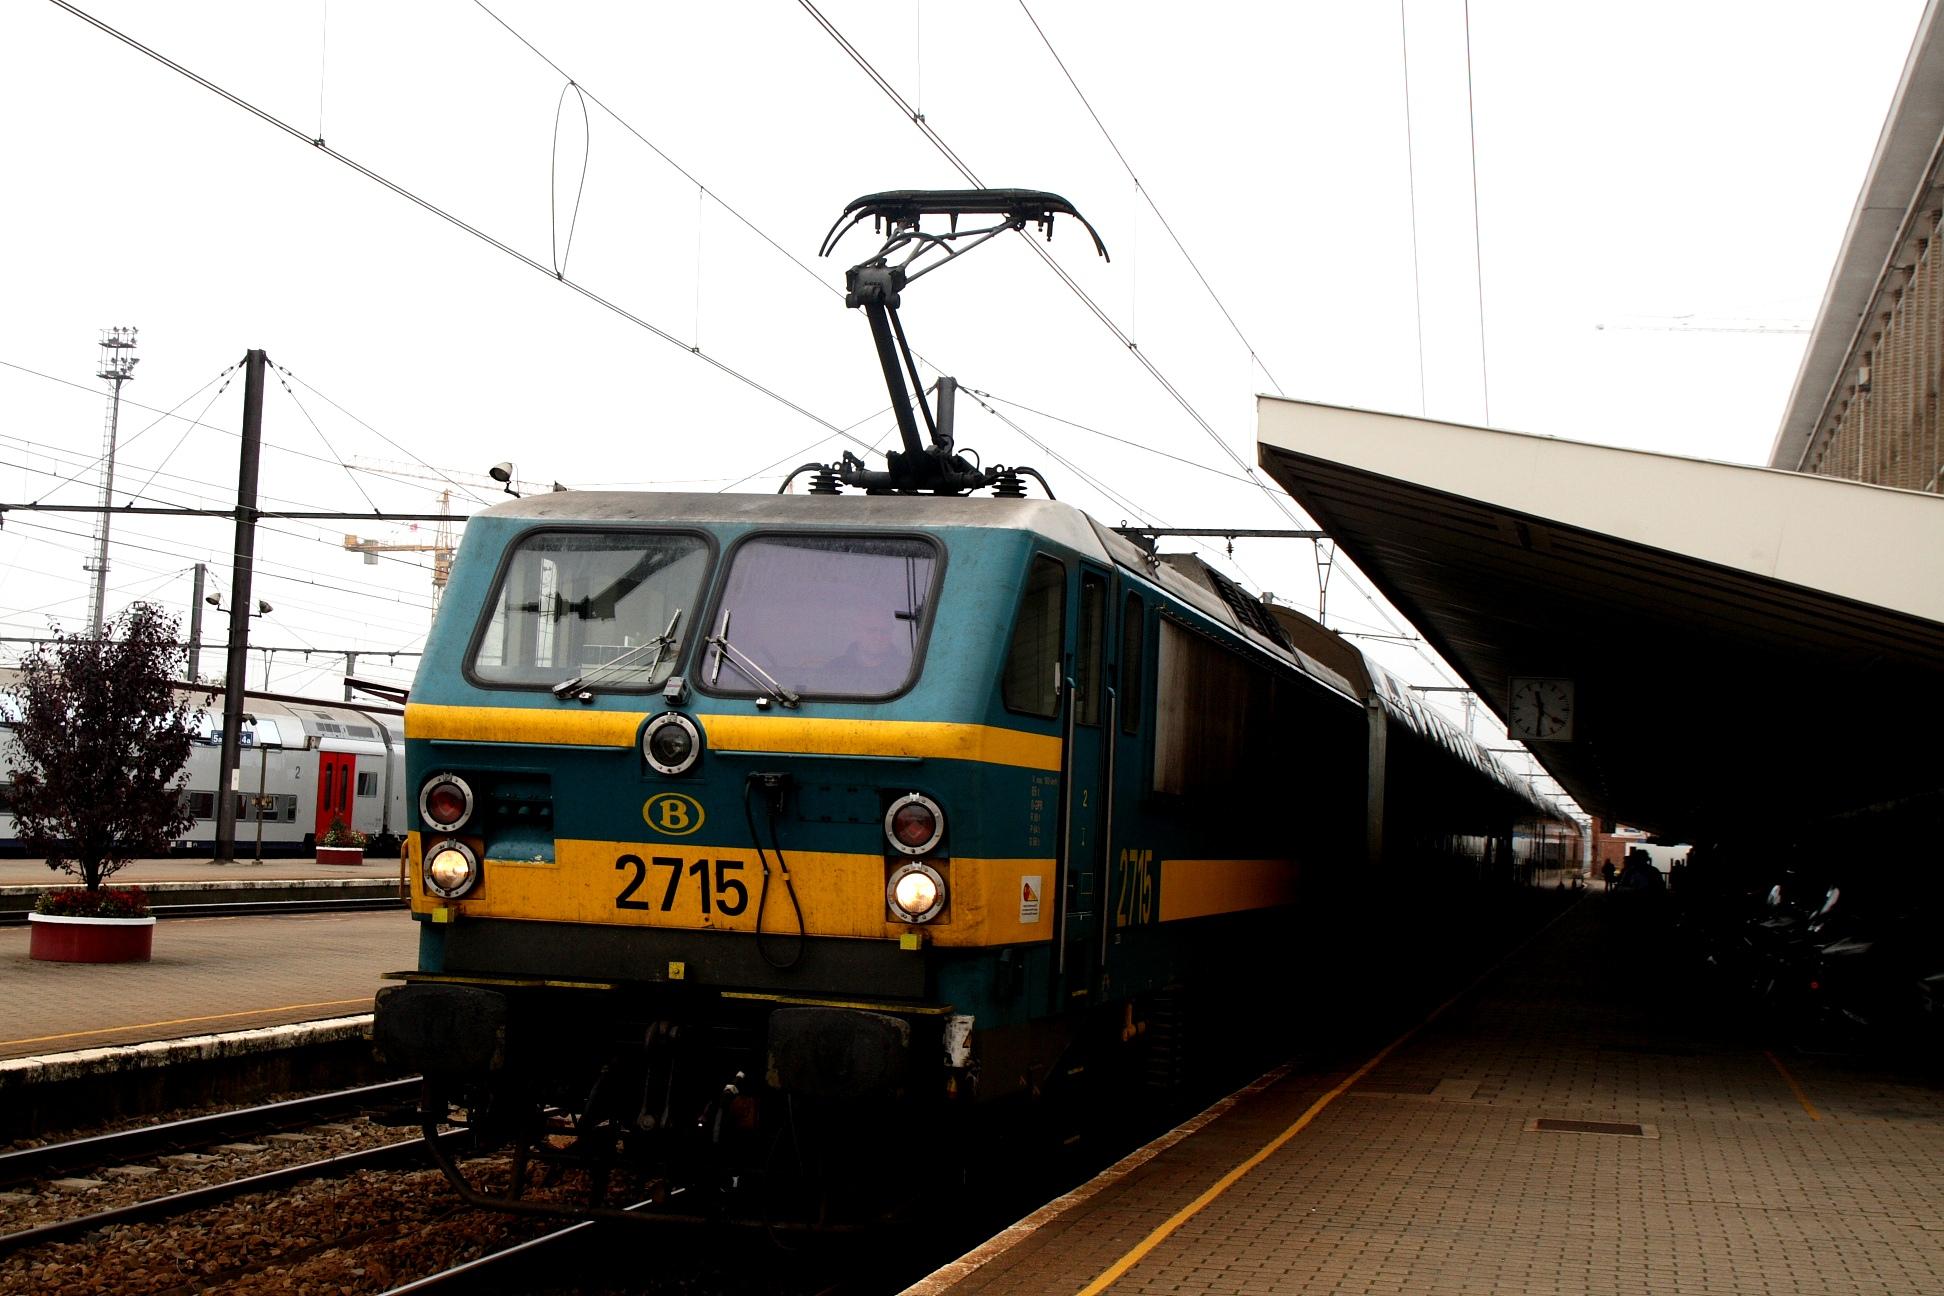 Hasselt Train Station